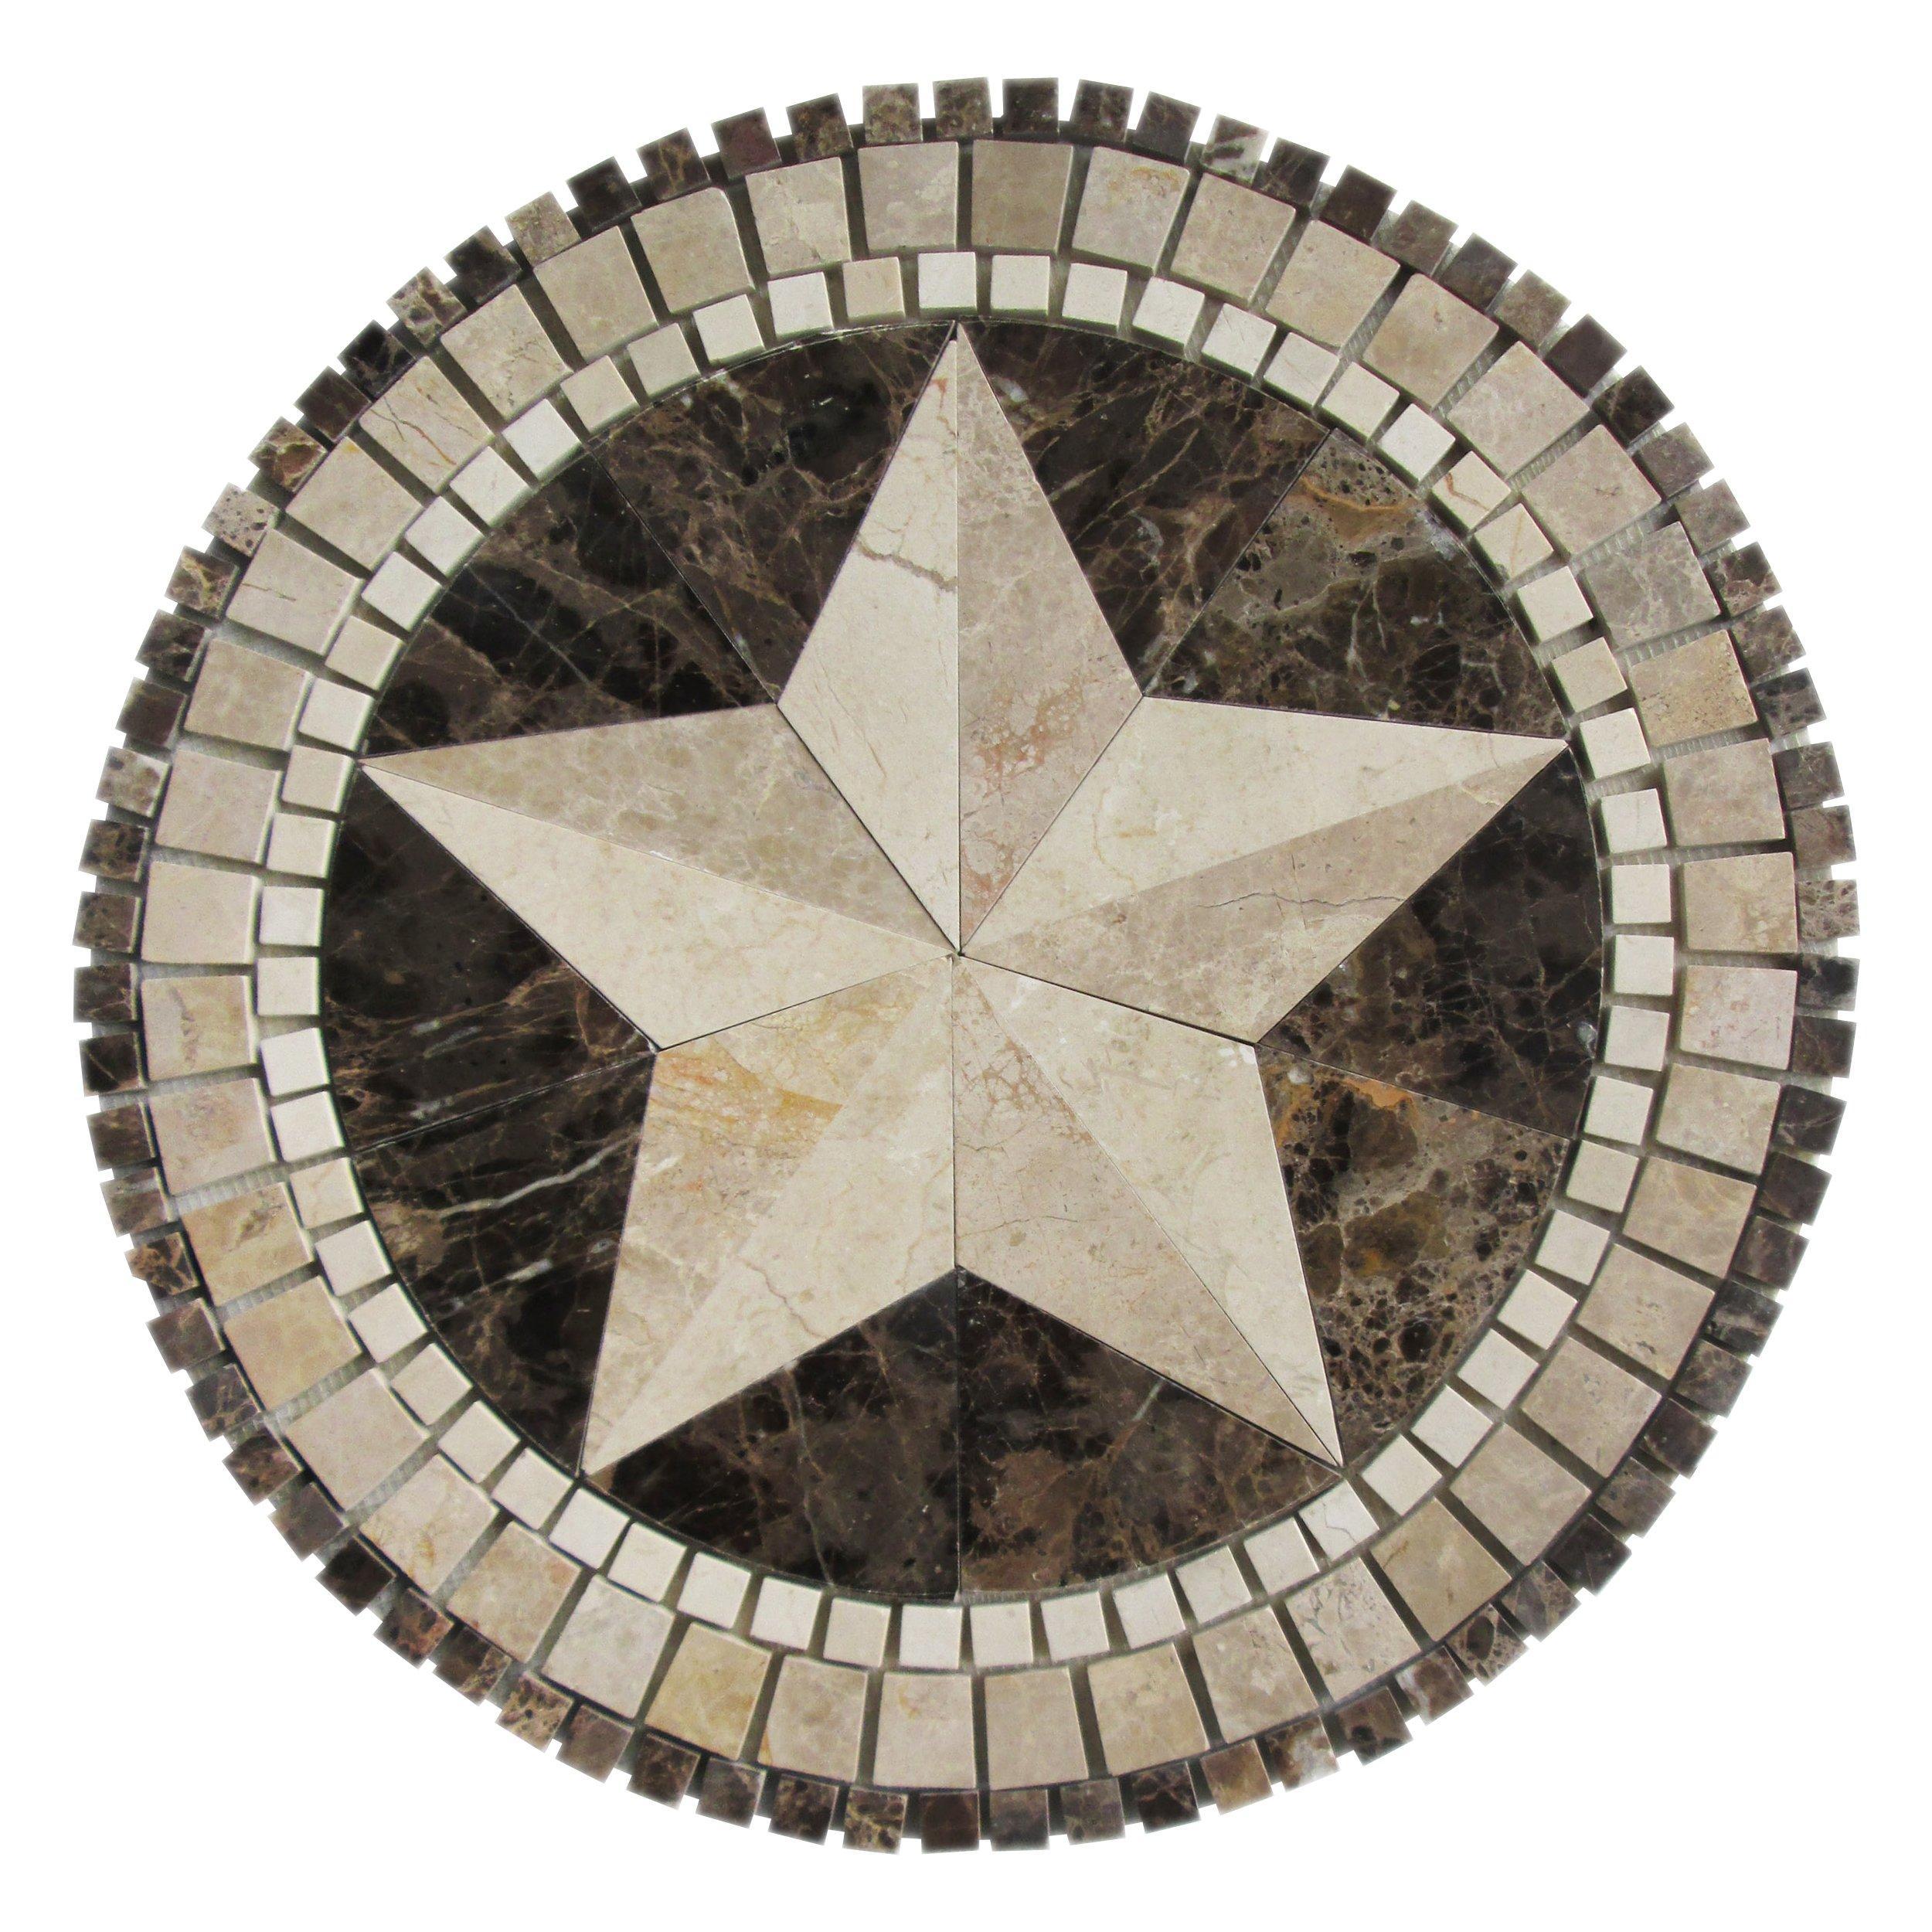 texas star marble medallion 24in x 24in 935400178 floor texas star marble medallion 24in x 24in 935400178 floor and decor